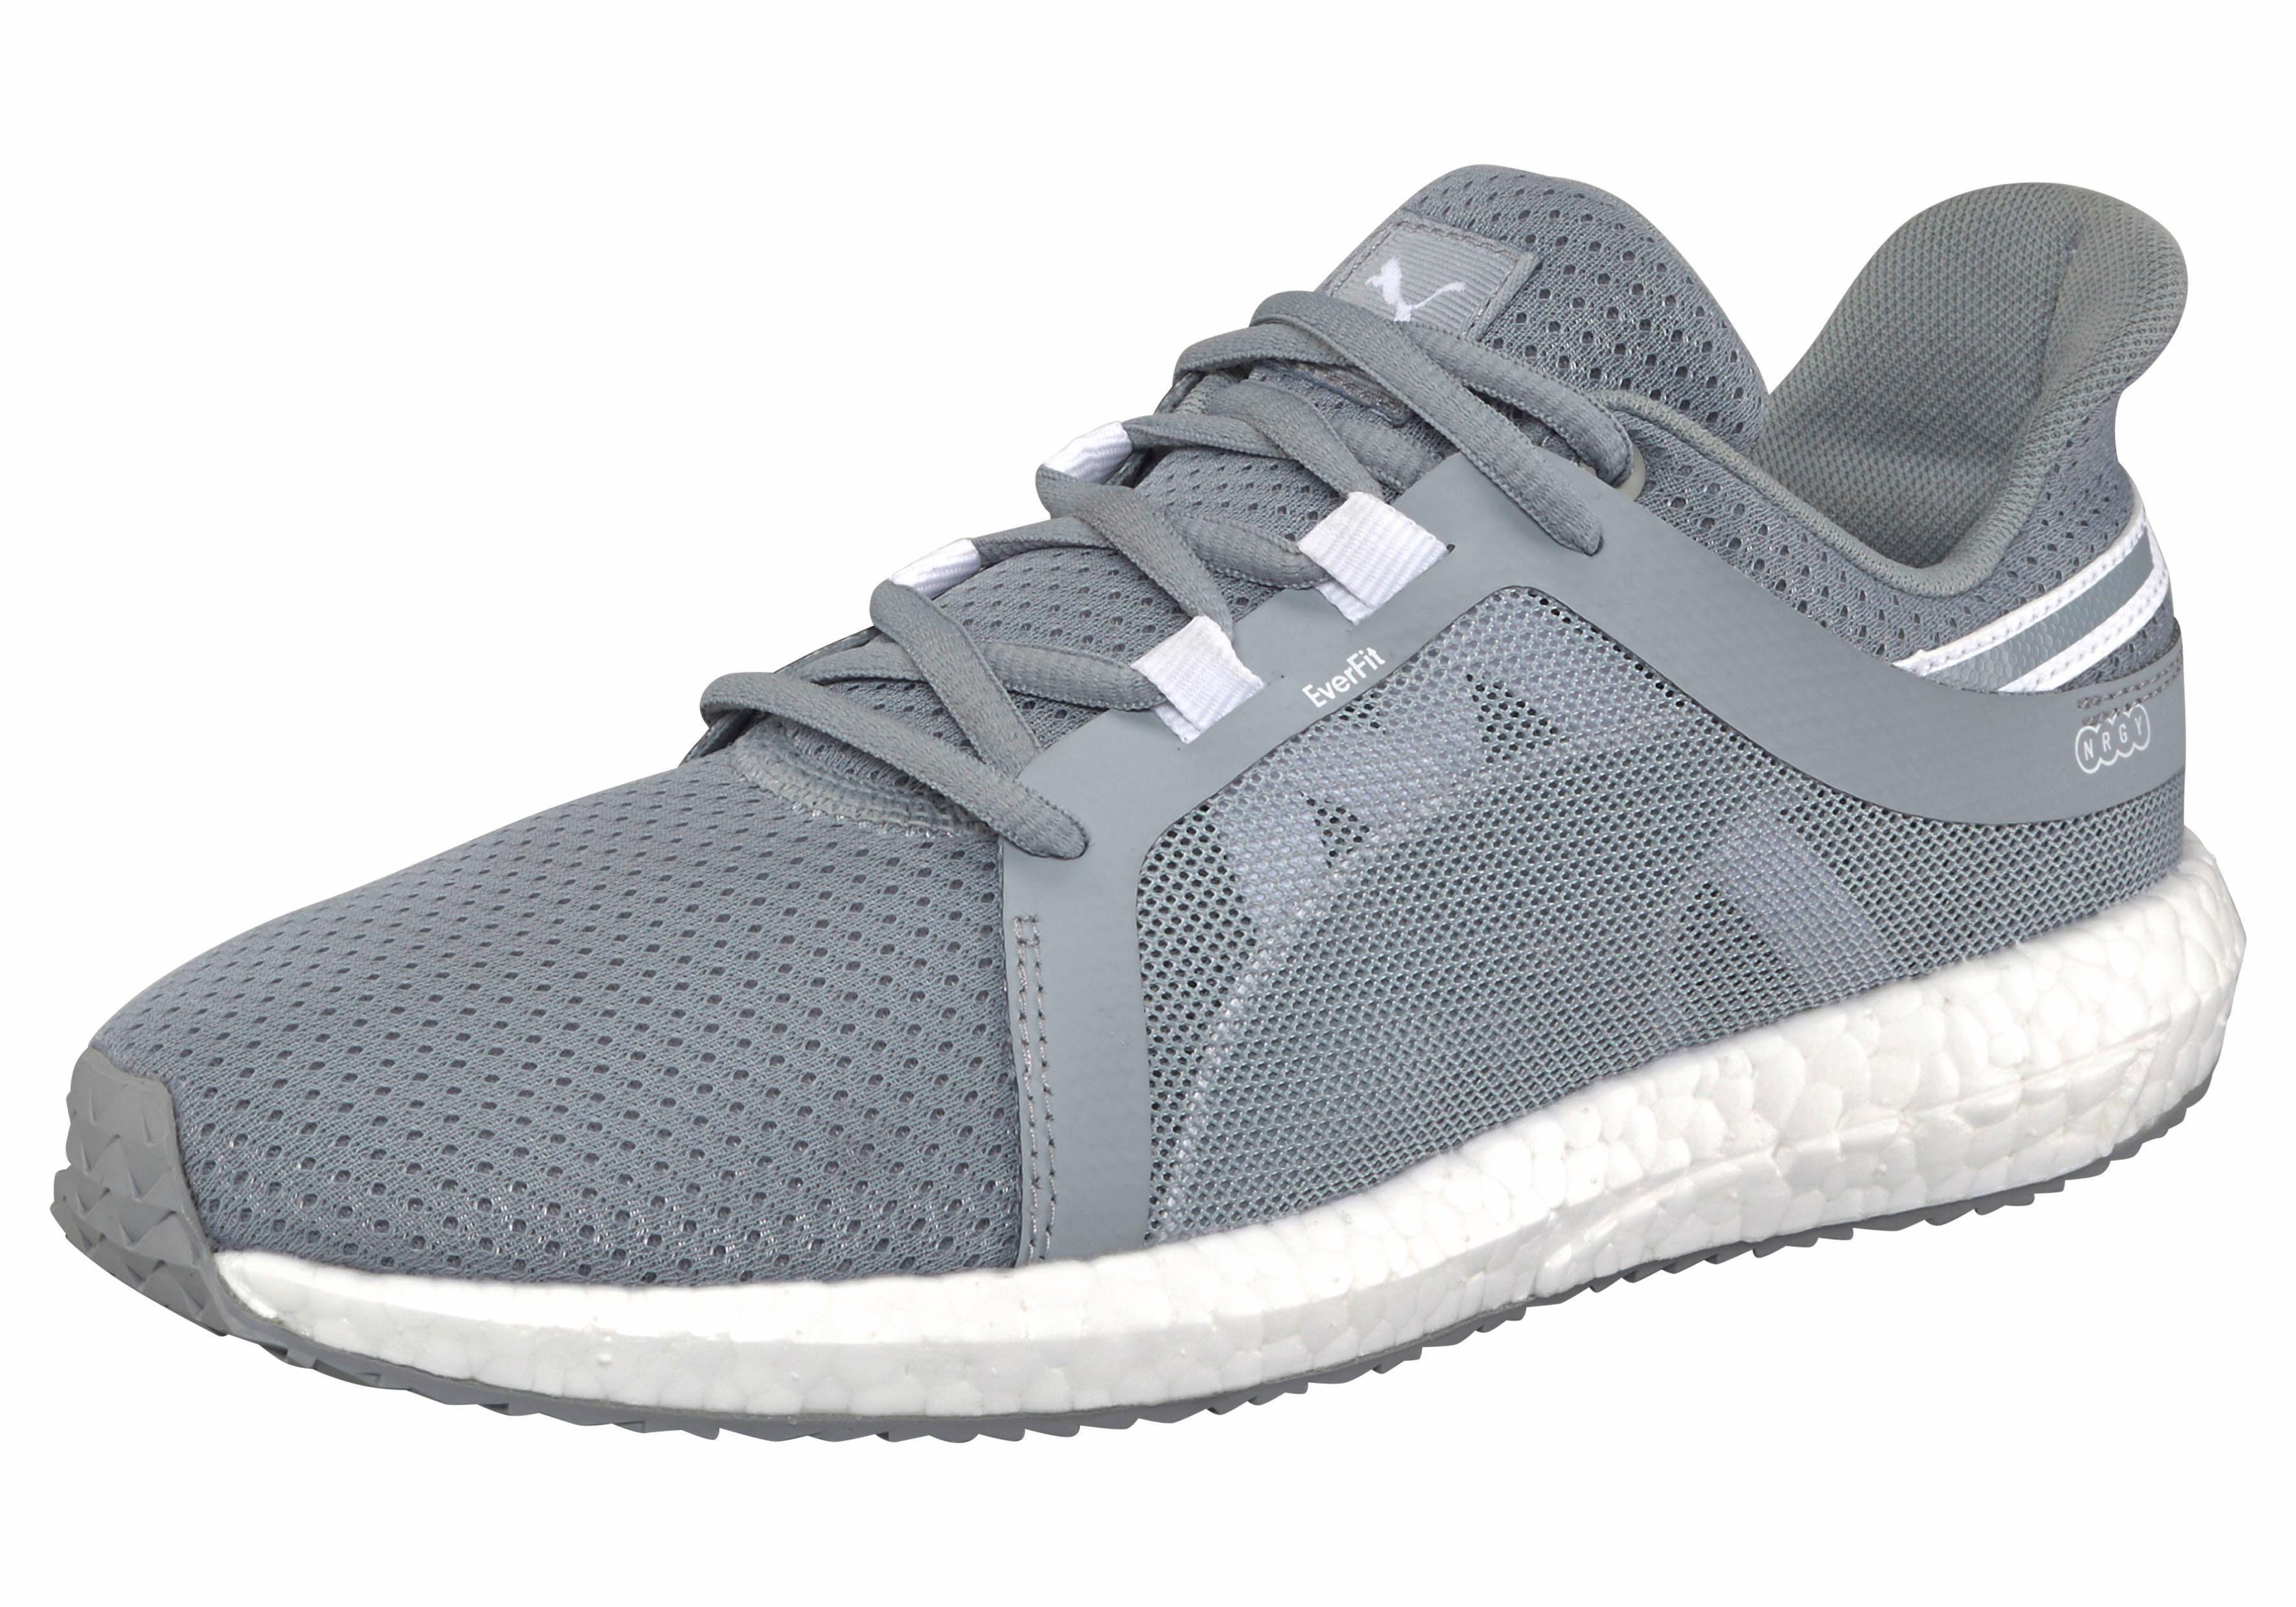 PUMA Mega NRGY Turbo 2 Sneaker online kaufen  grau